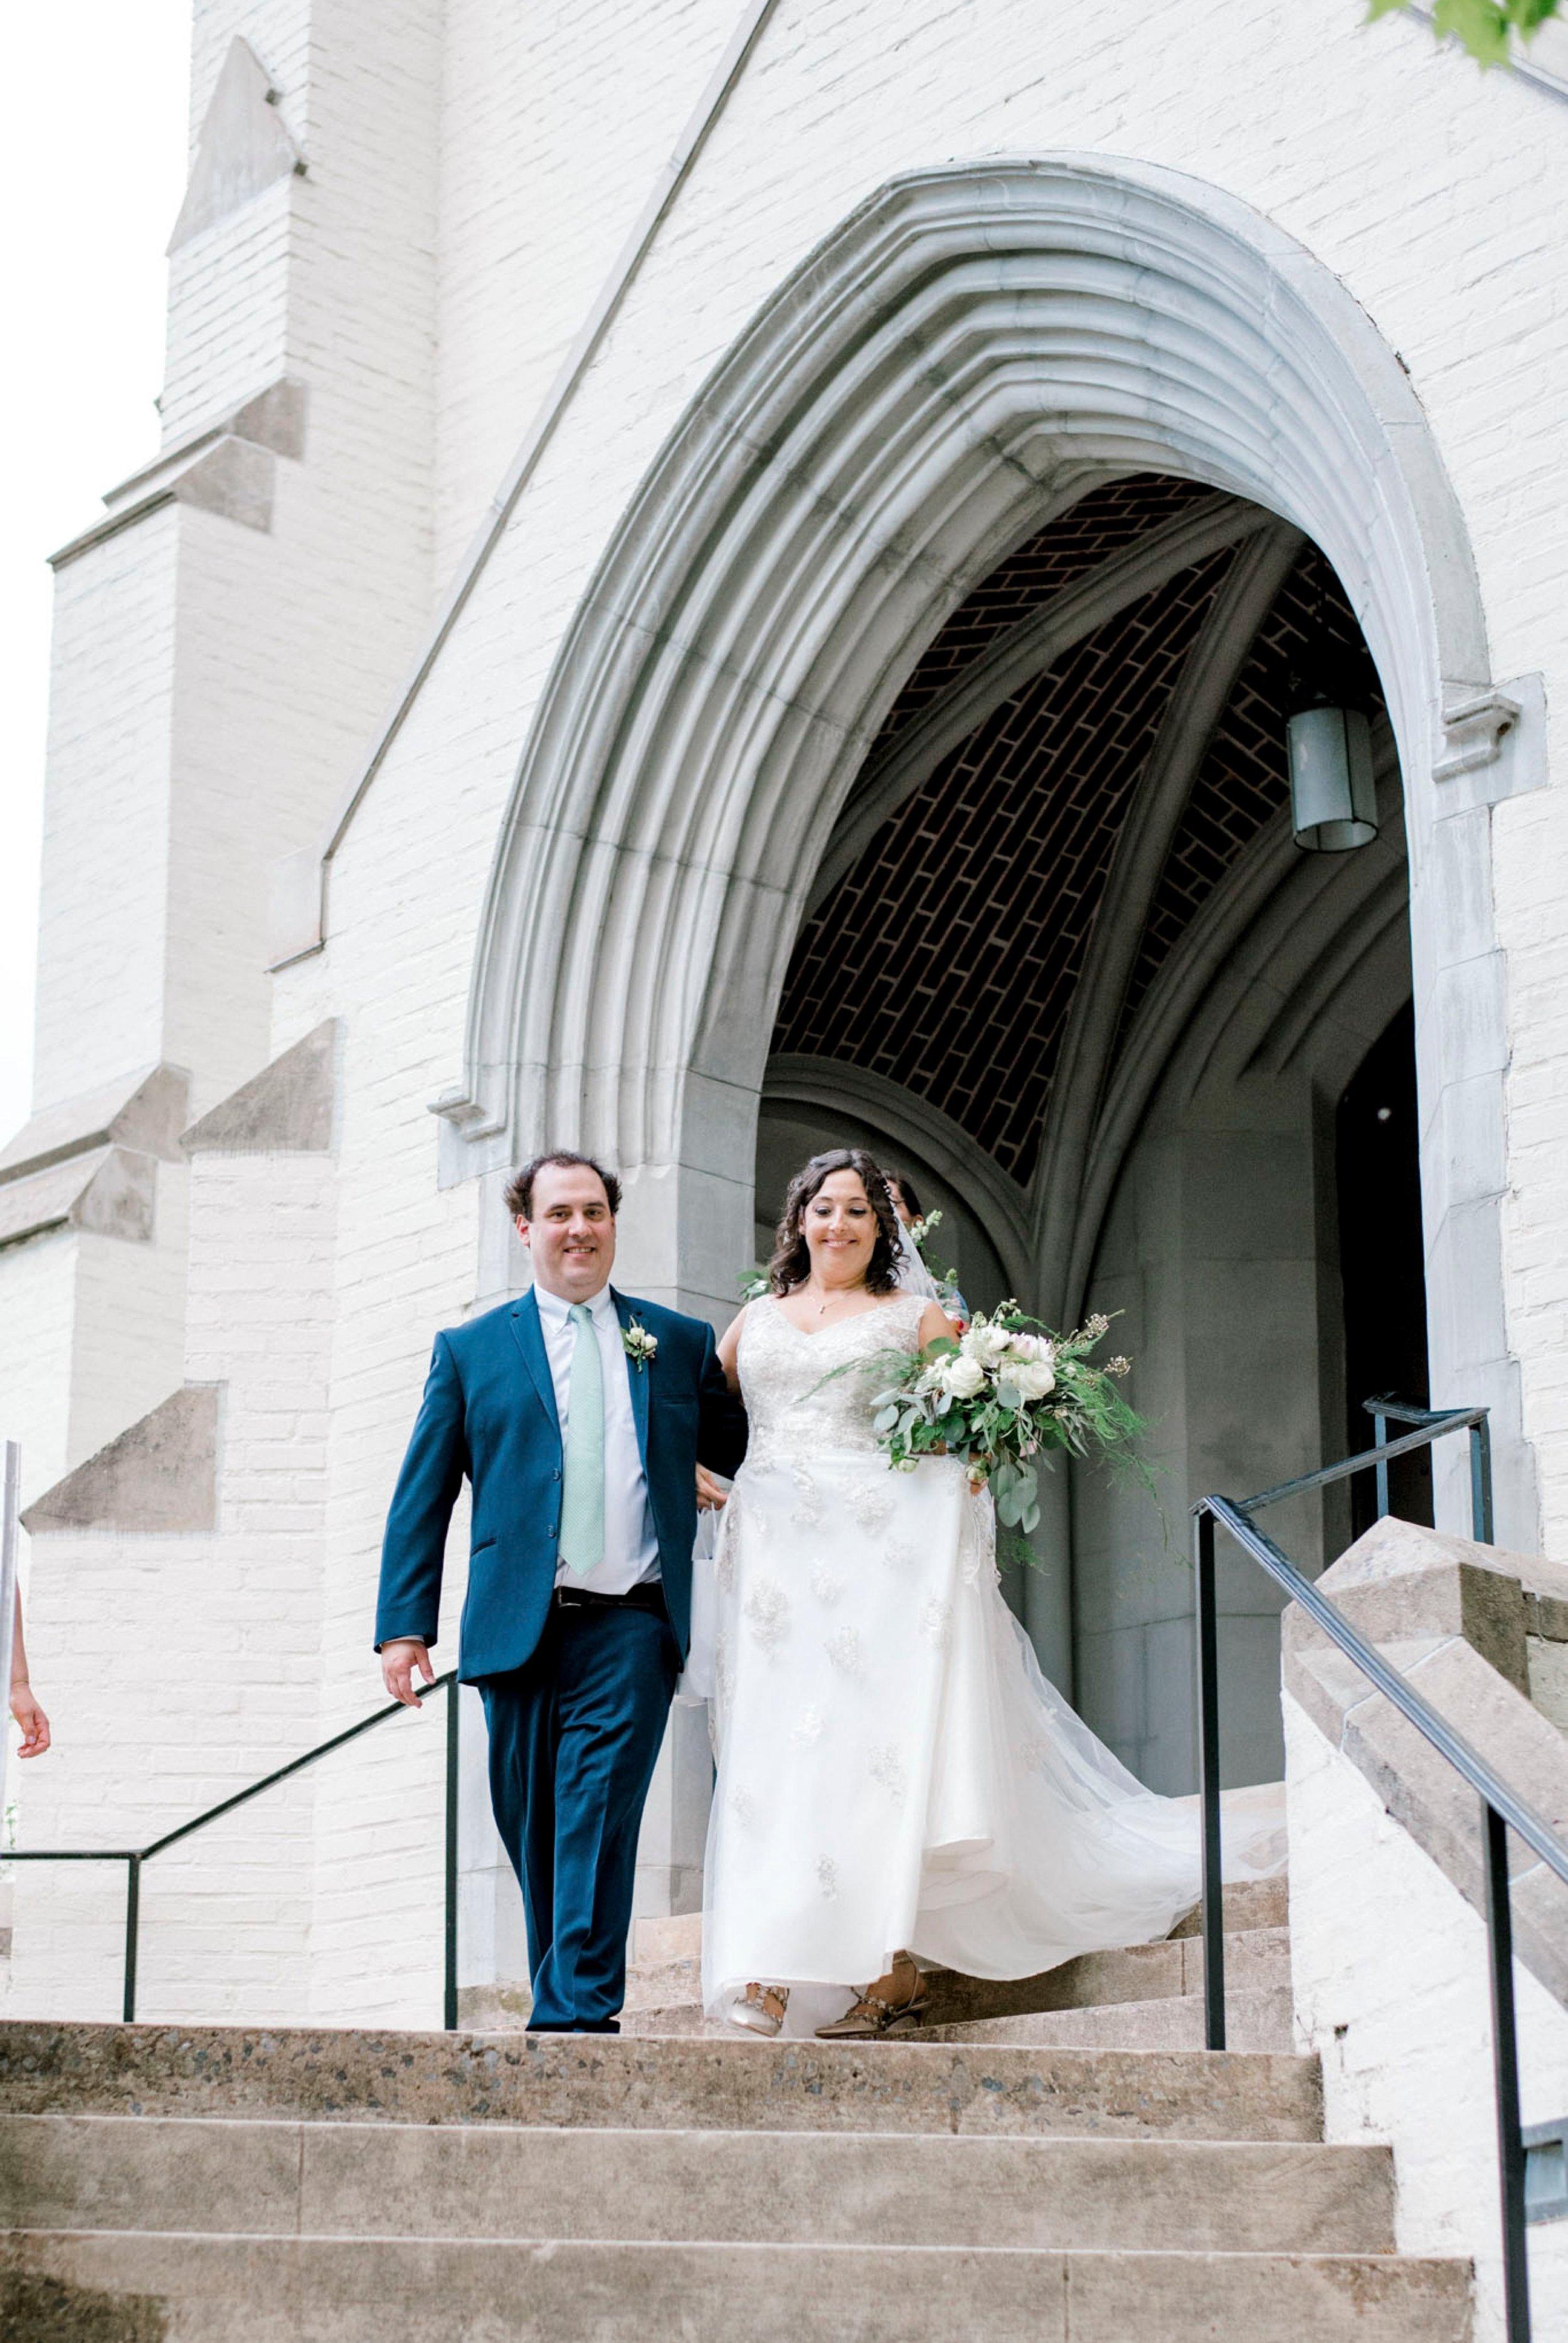 TheVirginianHotel_LynchburgVA_TheVirginianHotelWedding_Virginiaweddingphotographer_Lynchburgvawedding 36.jpg